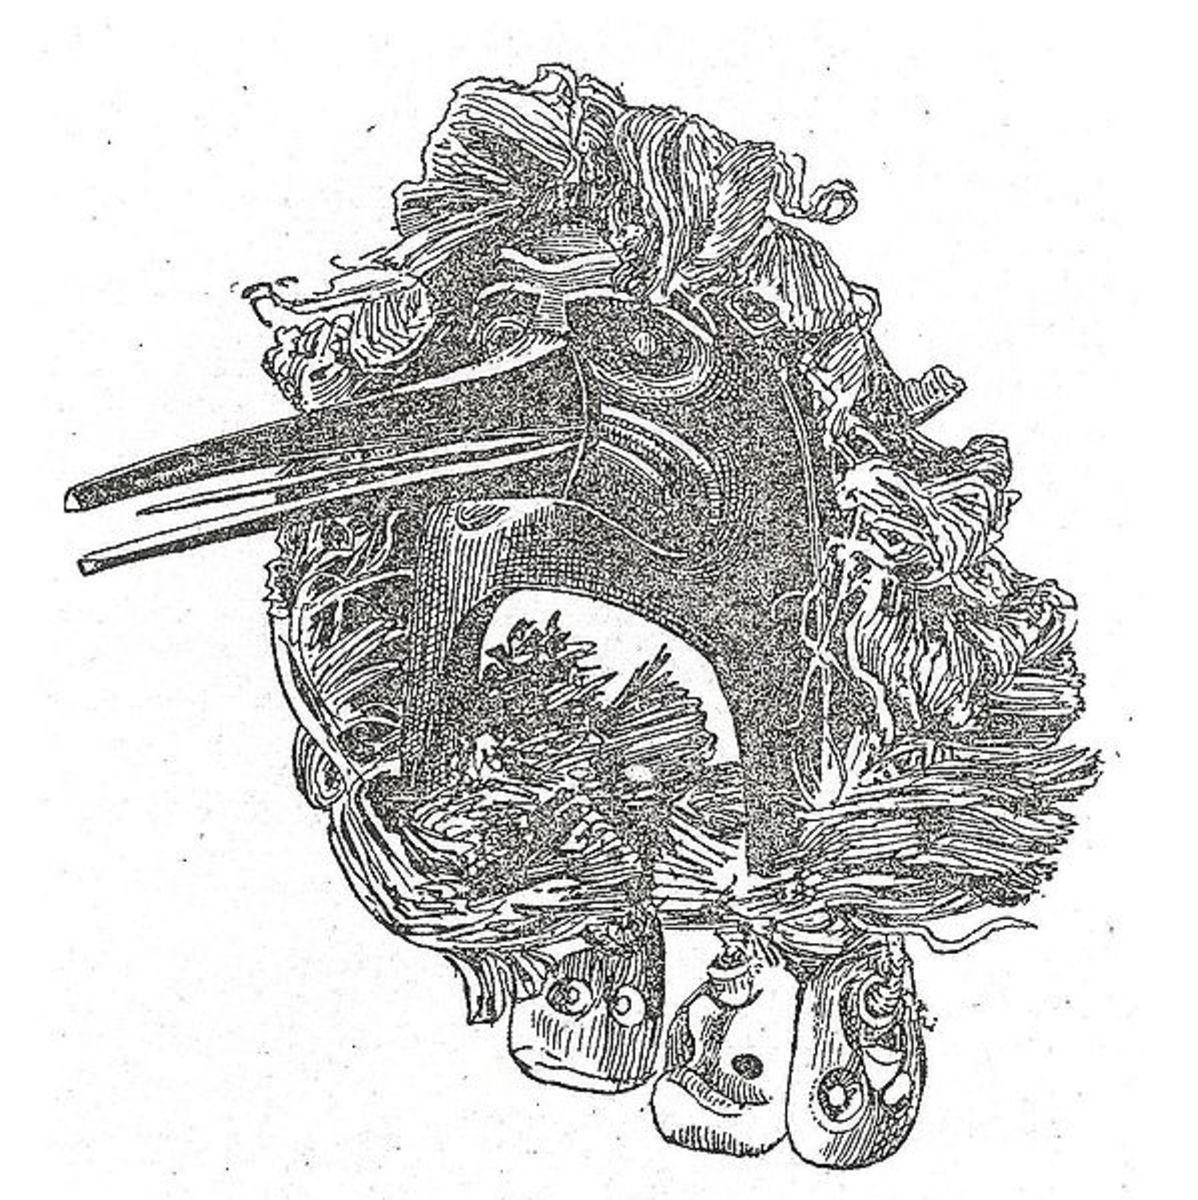 "Kwakiutl mask drawing from ""The Social Organization and the Secret Societies of the Kwakiutl Indians"", Boas (1897)"